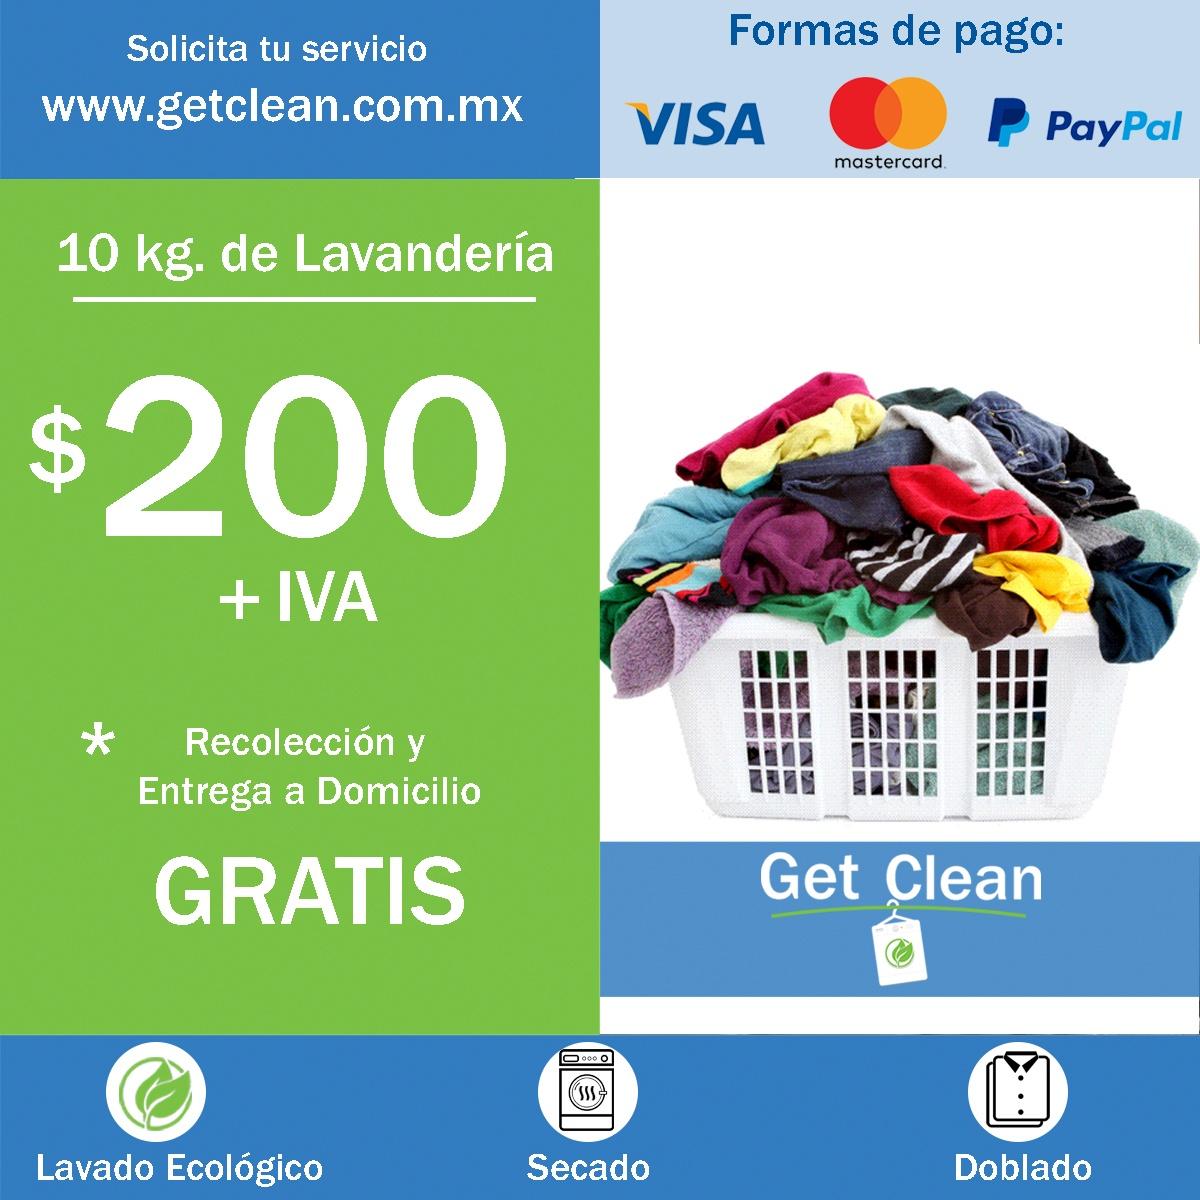 https://0201.nccdn.net/1_2/000/000/171/fb9/2018--11---04--10-kg-de-Lavanderia-200-pesos-1200x1200.jpg